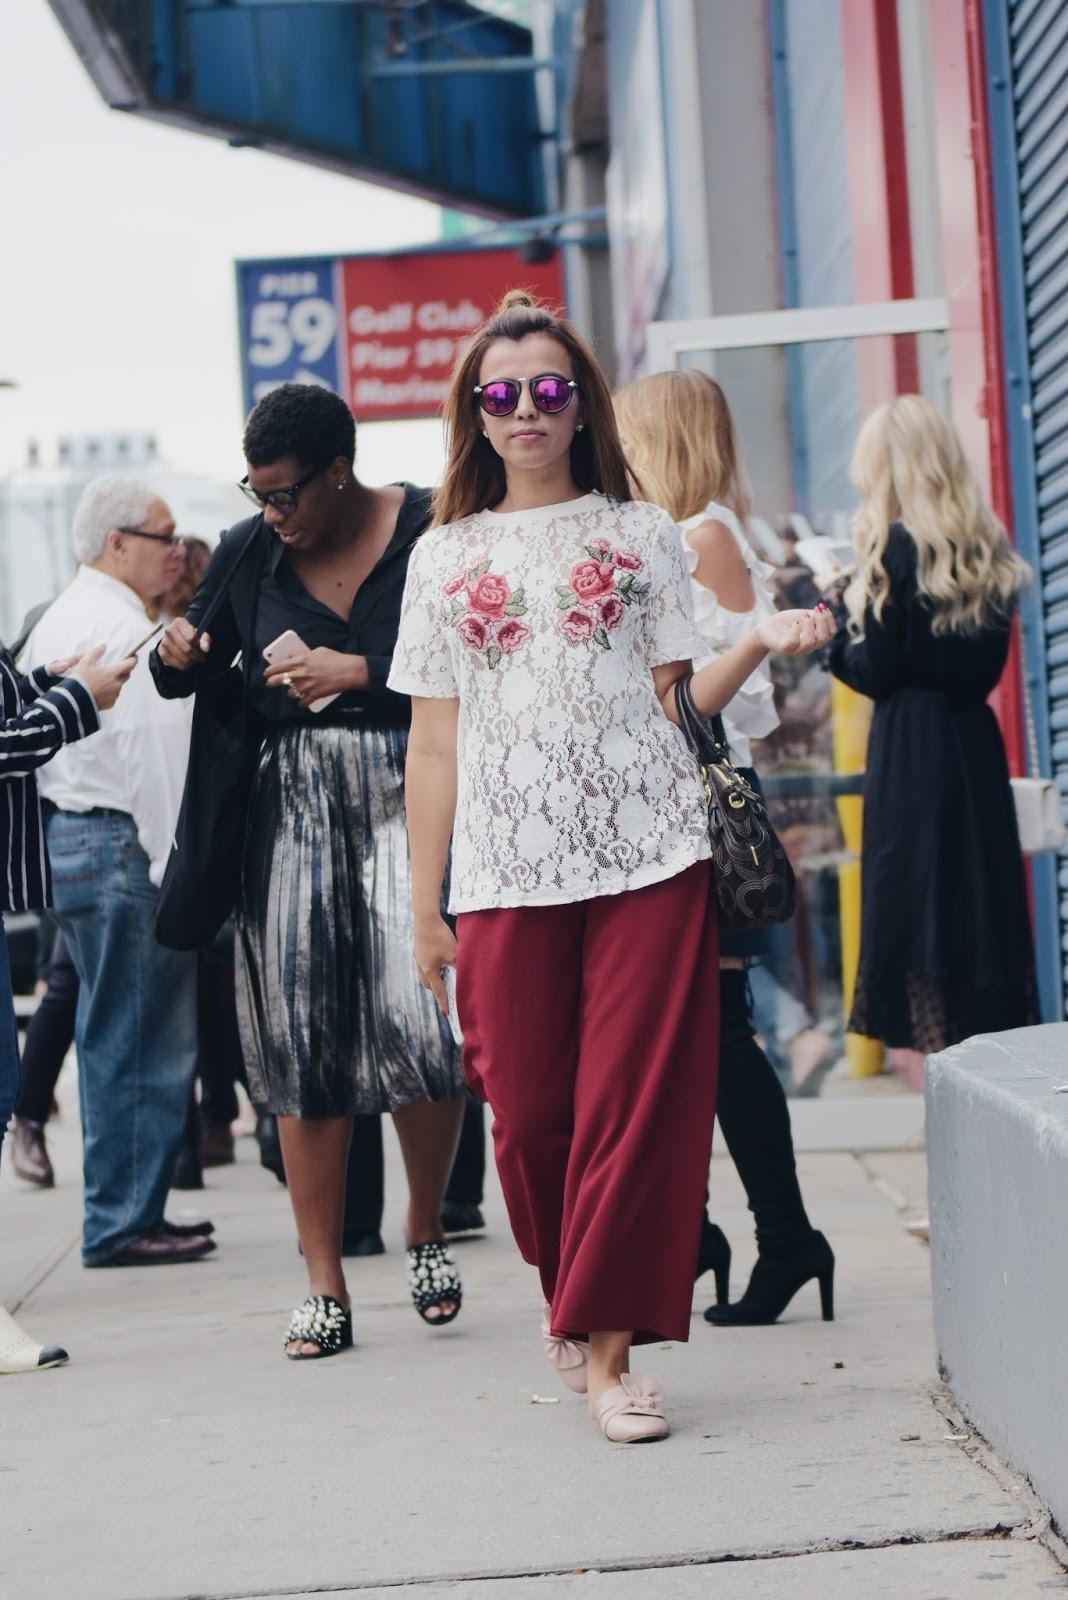 NYFW - Day 1| Spring/Summer 2018 Pamella Roland  by Mari Estilo